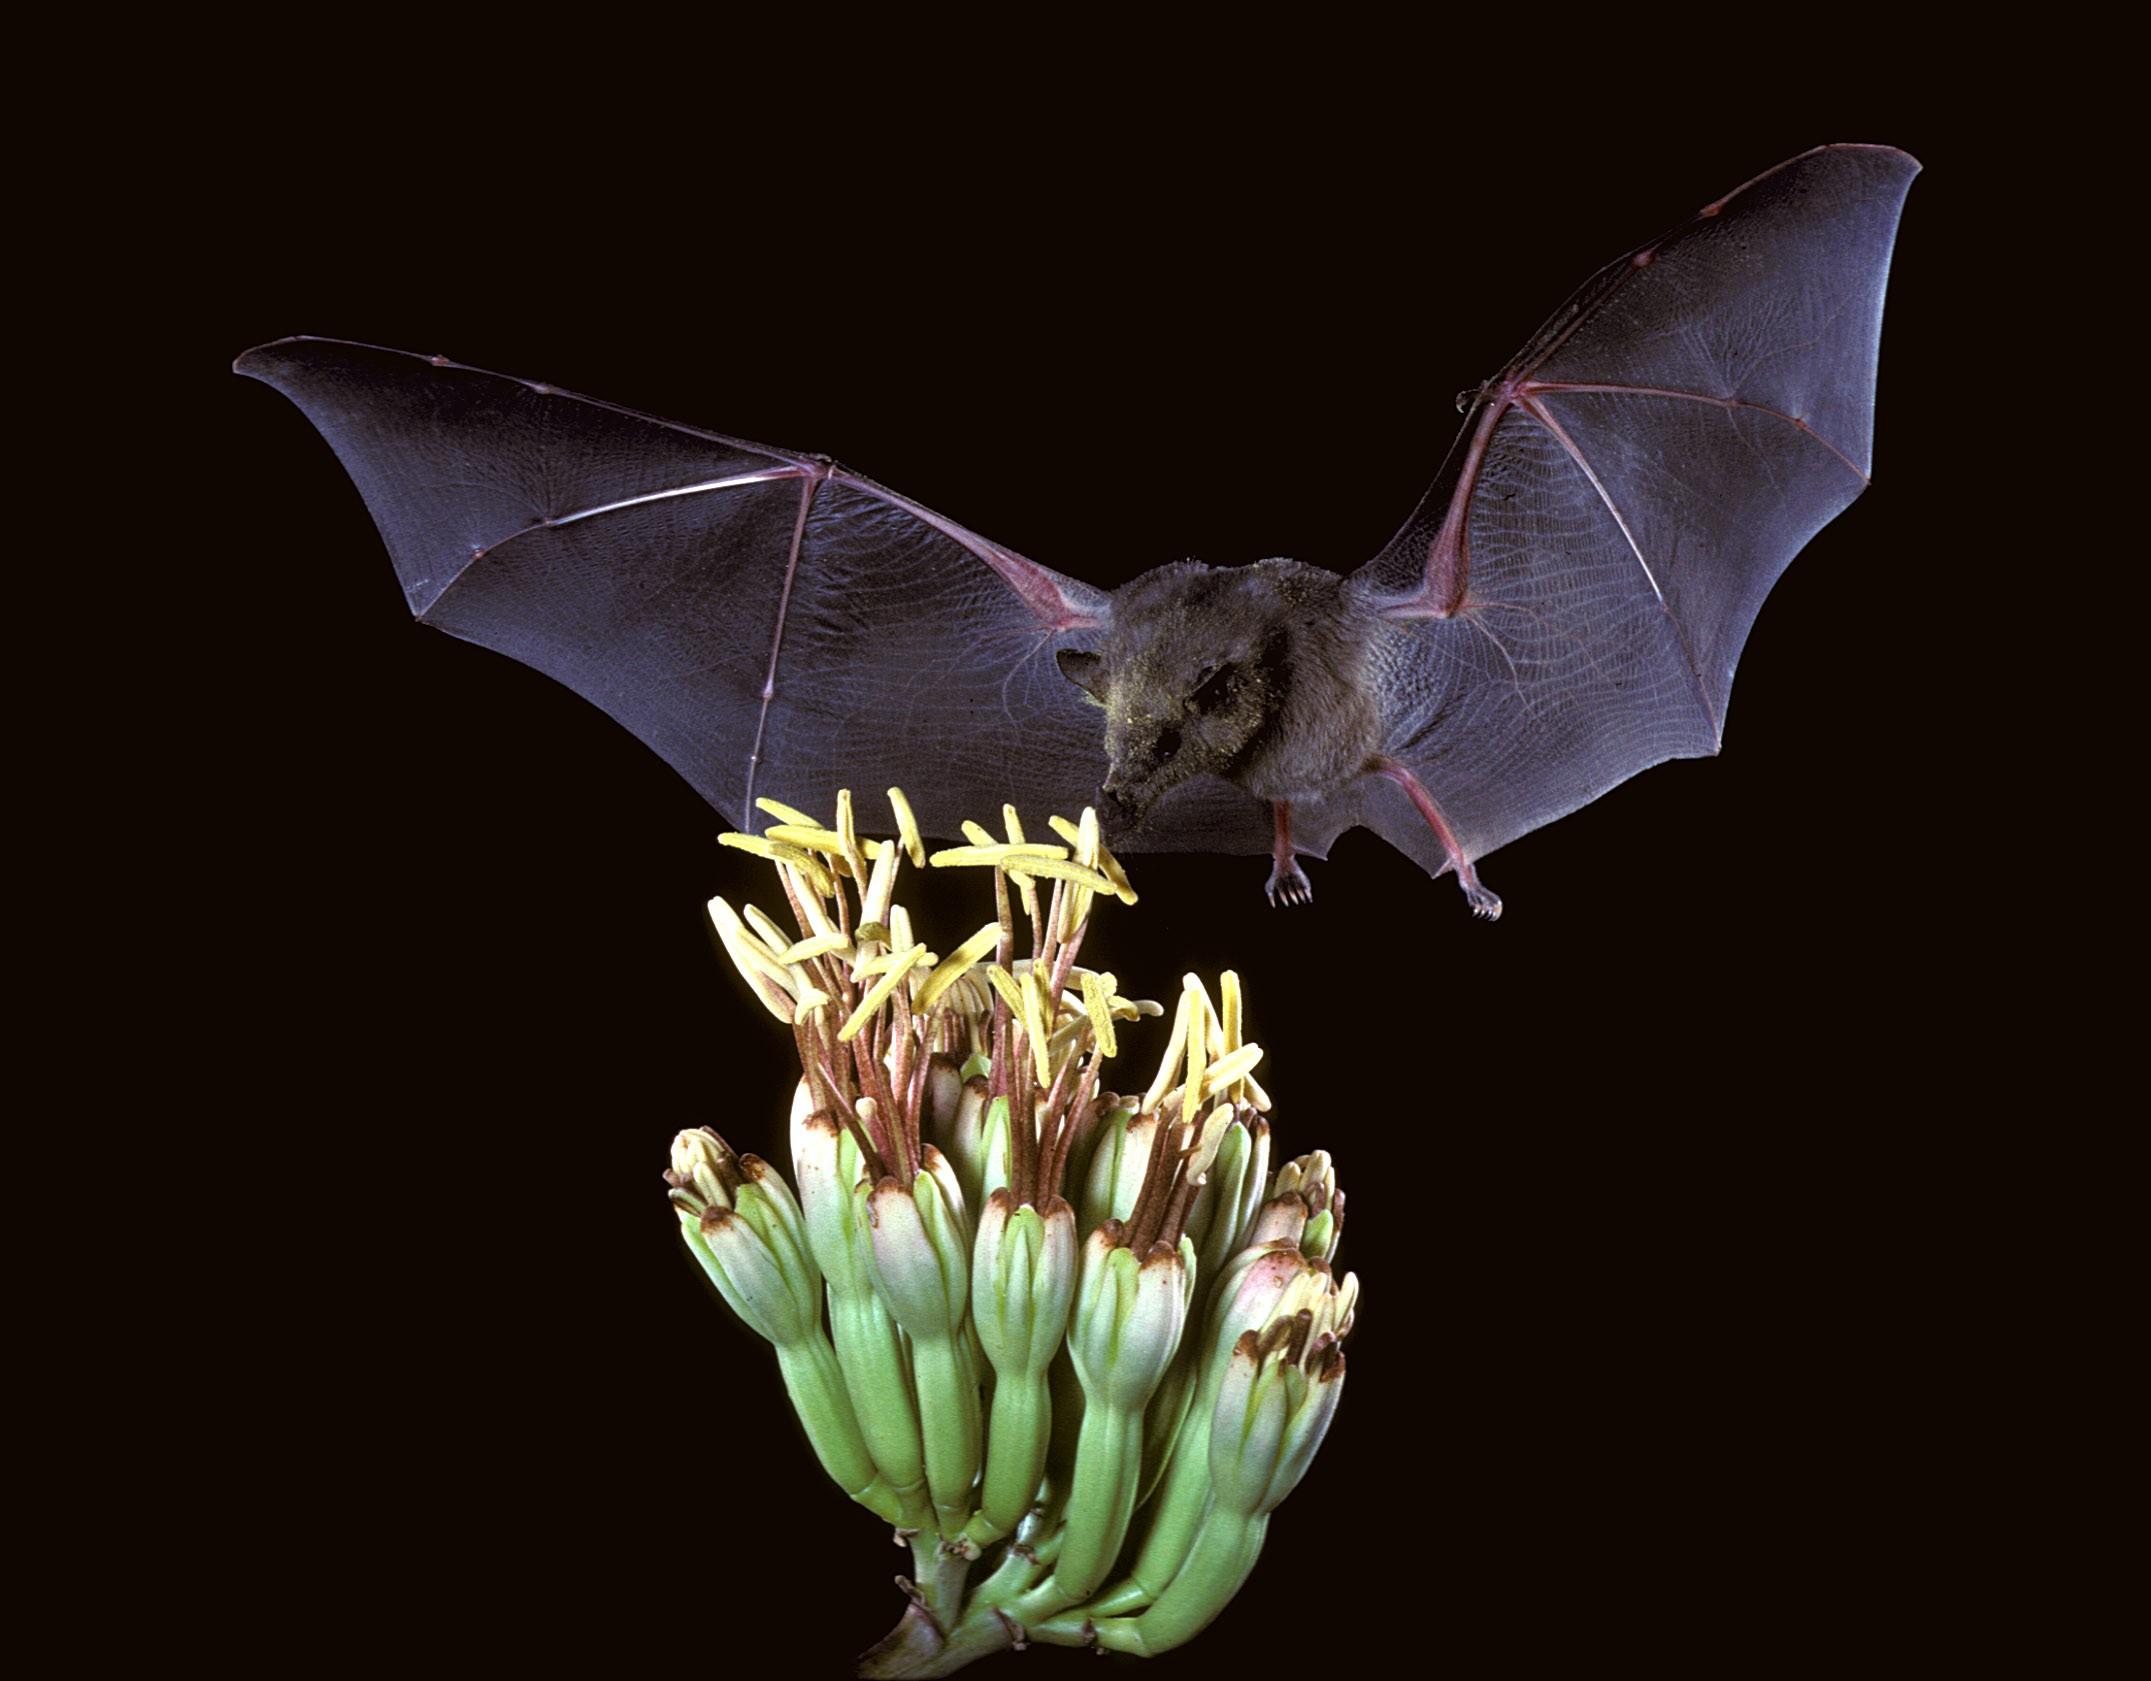 Summer Bat Walks